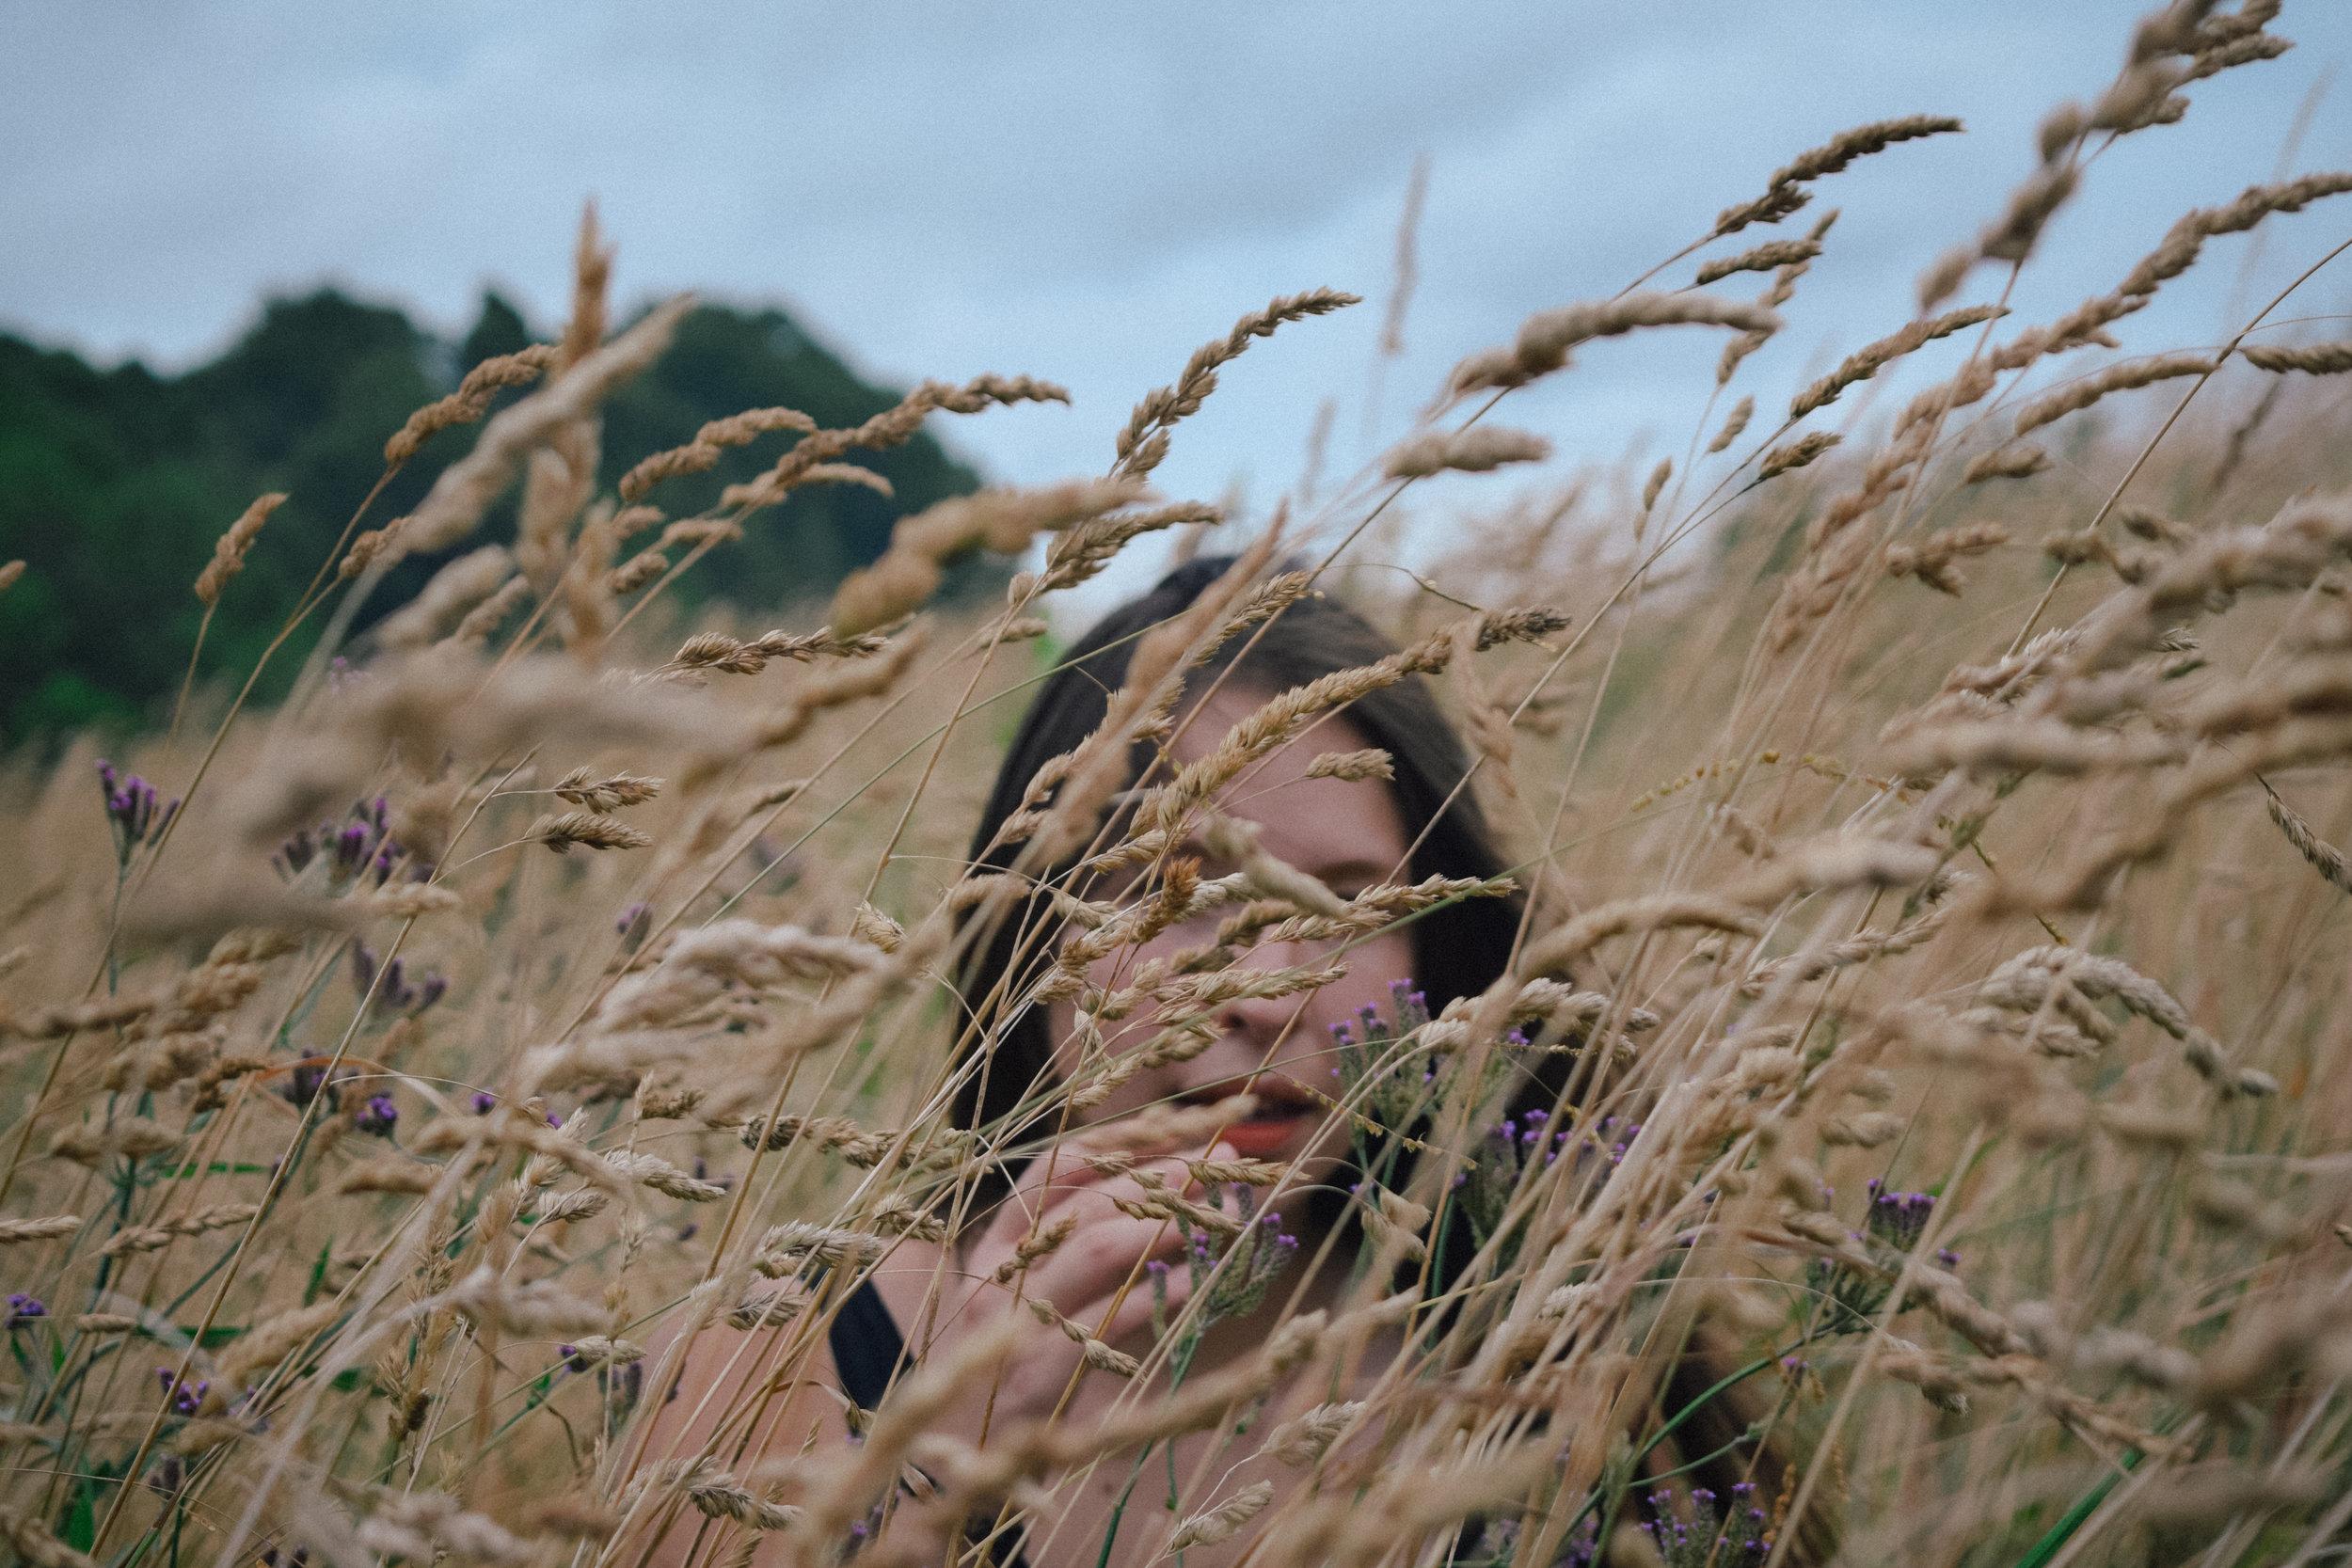 Wheat and wildflowers in Coromandel